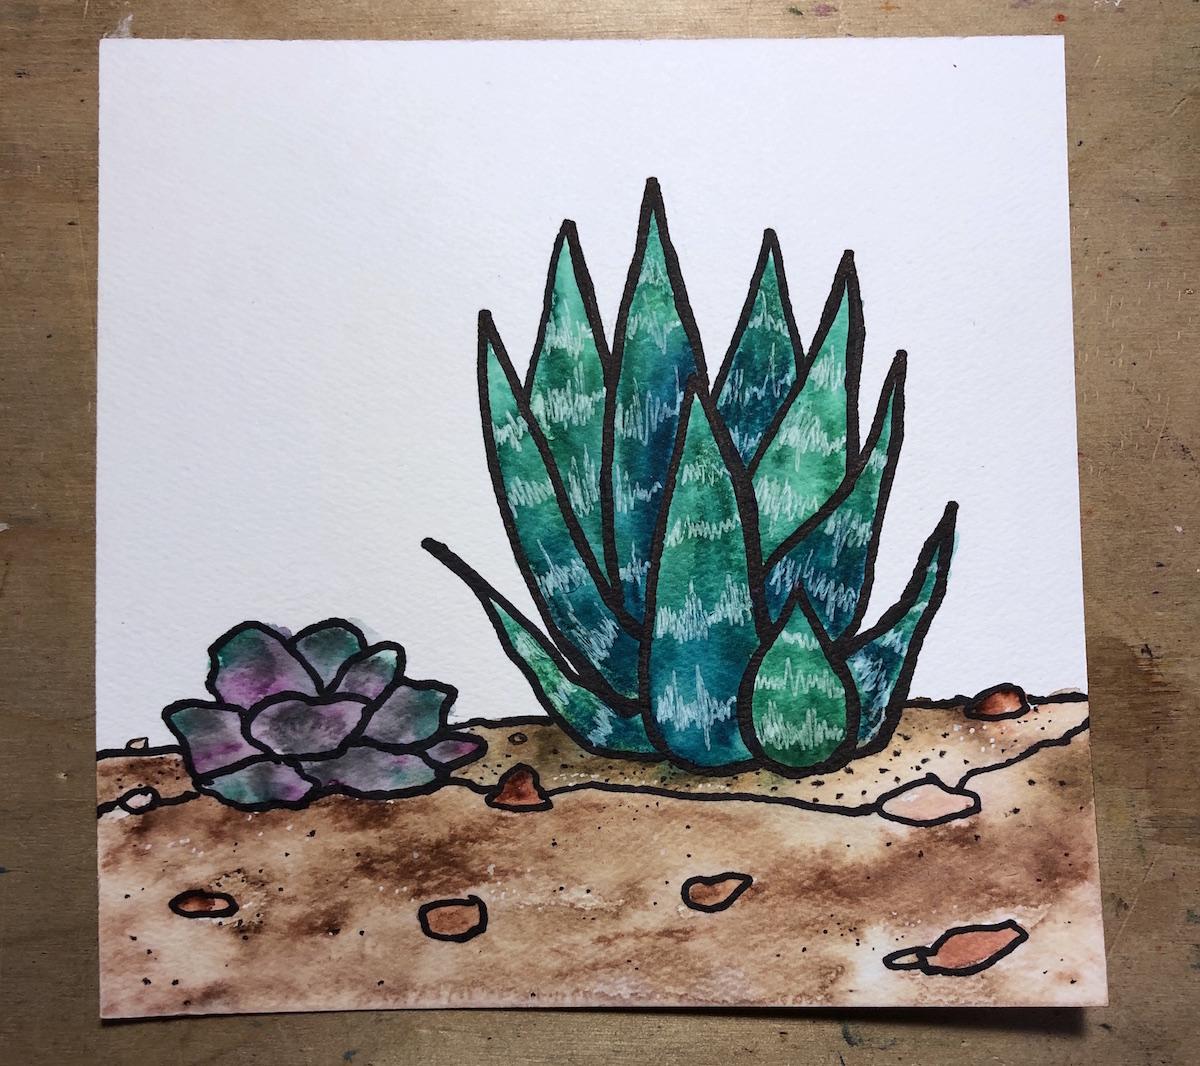 watercolor artwork of succulents